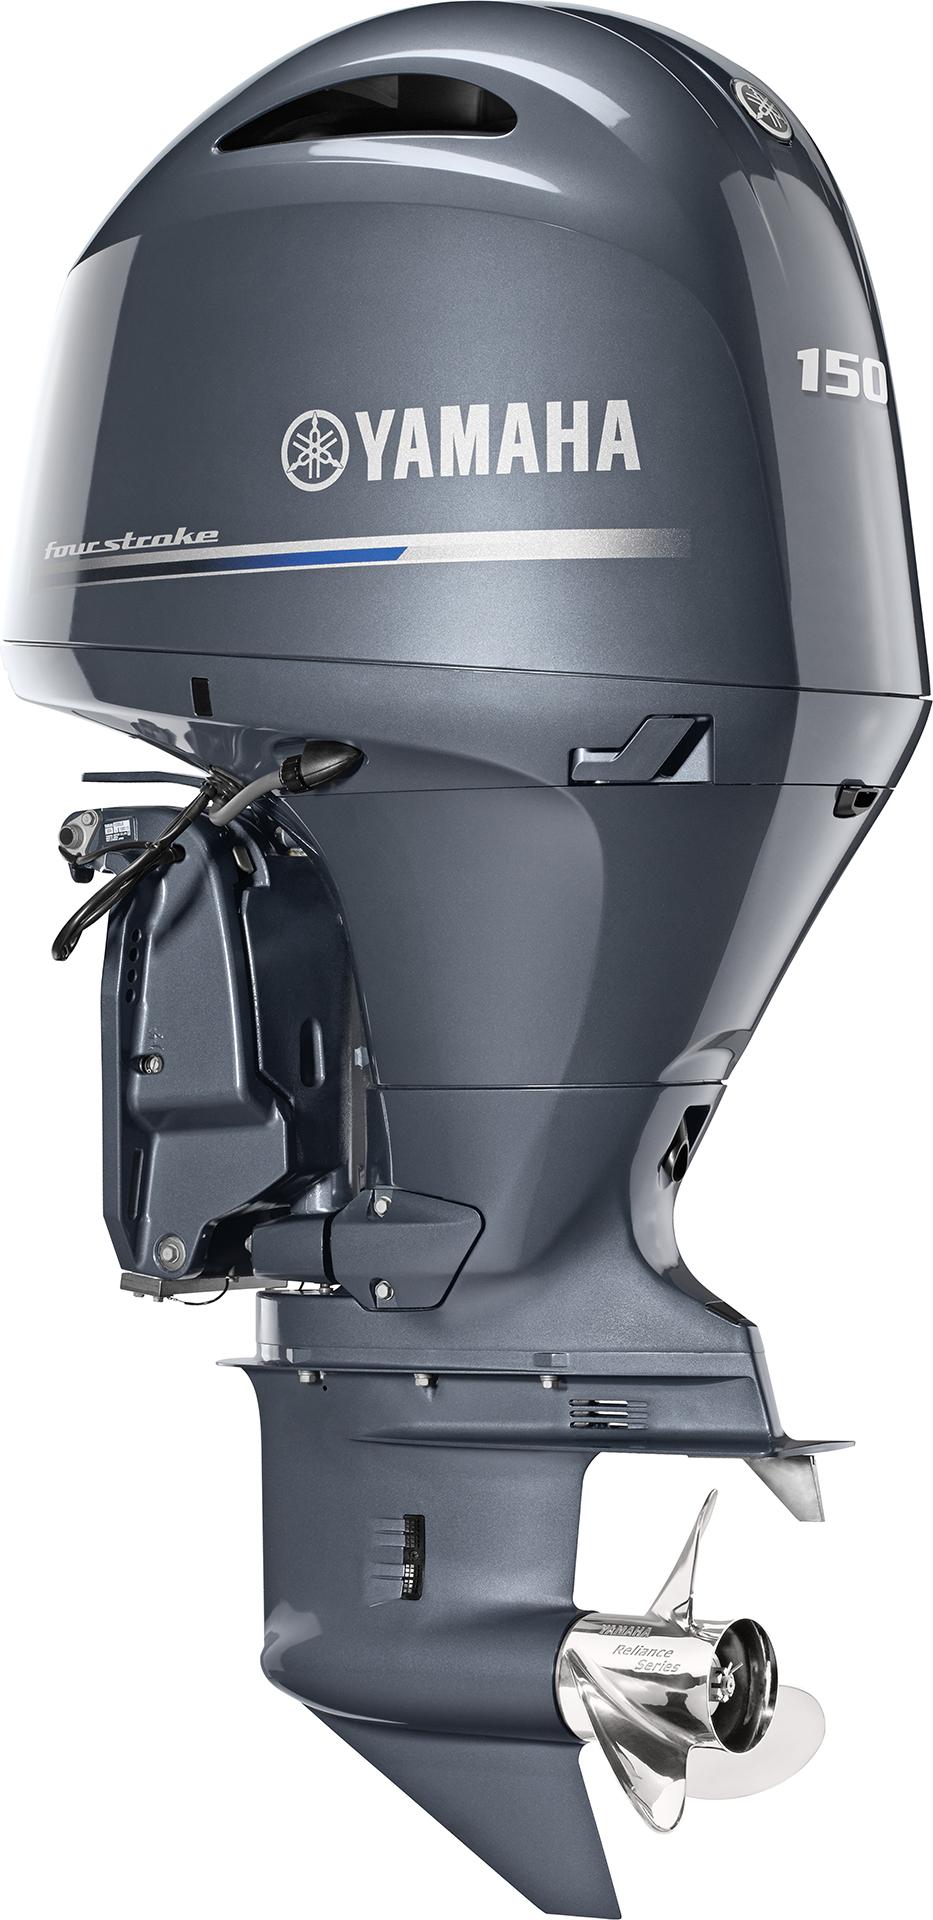 Yamaha F200XB 2.7L InLine-4